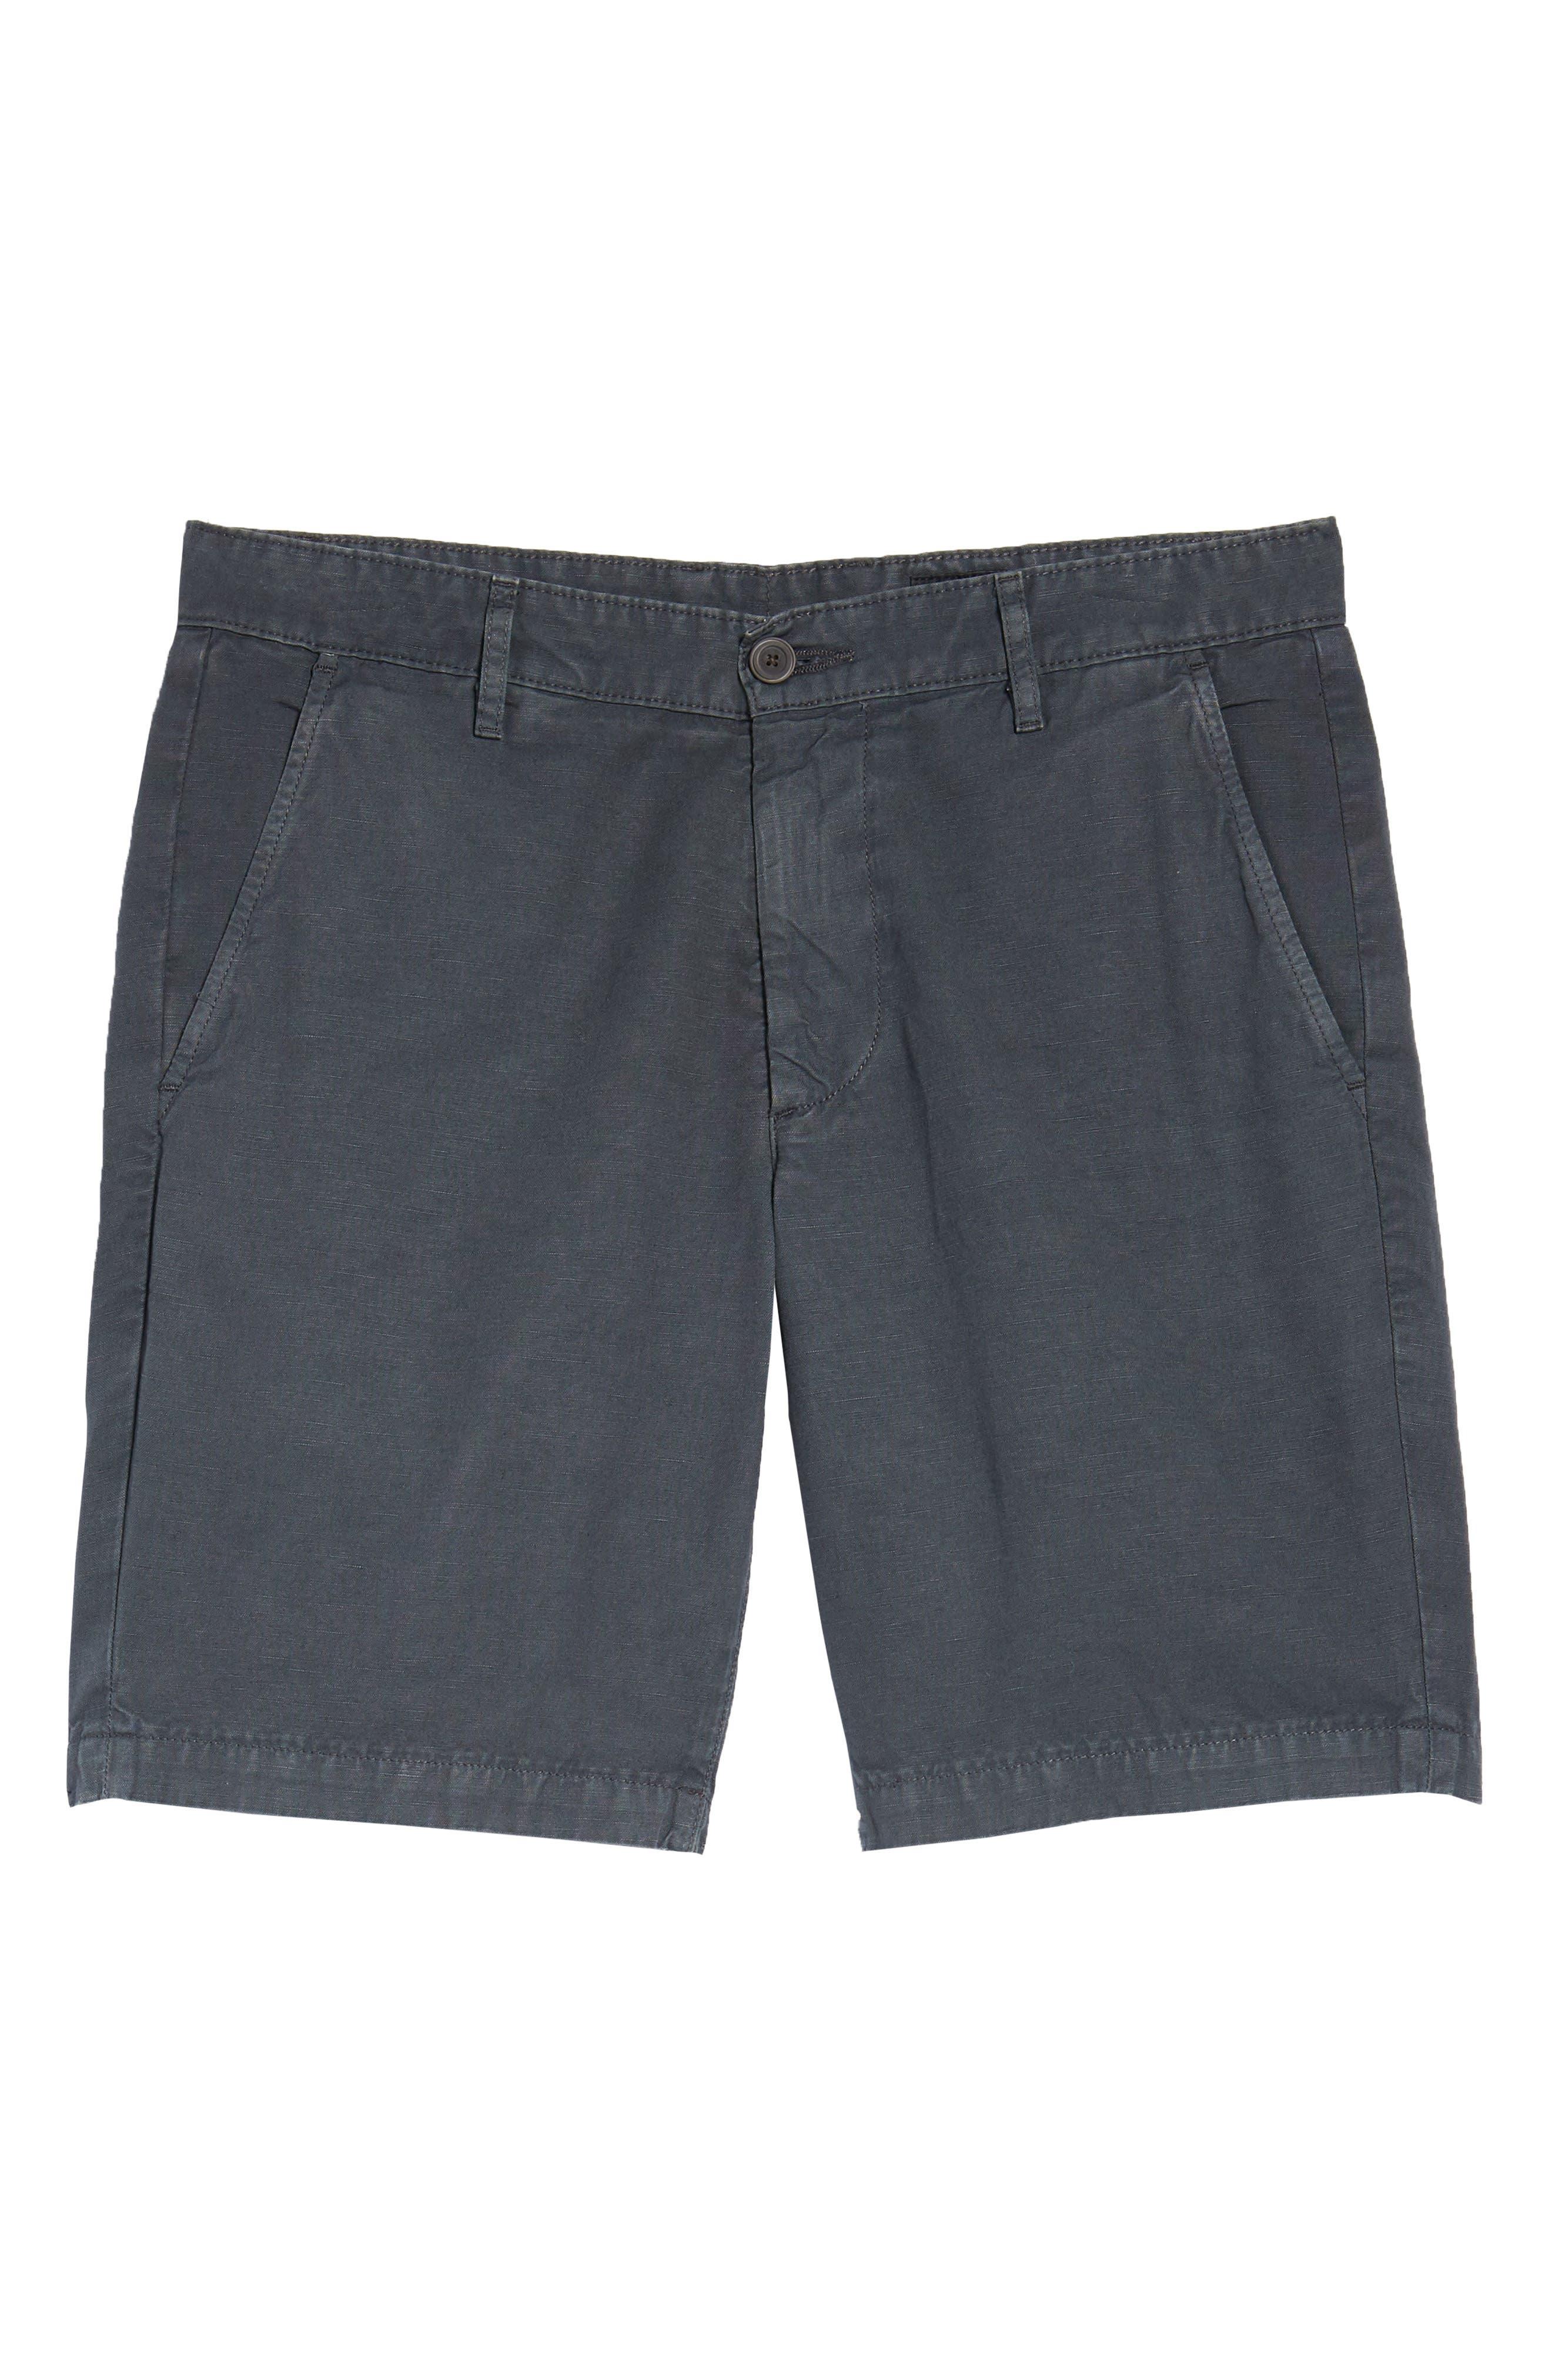 Wanderer Slim Fit Cotton & Linen Shorts,                             Alternate thumbnail 6, color,                             SULFUR SMOKE GREY